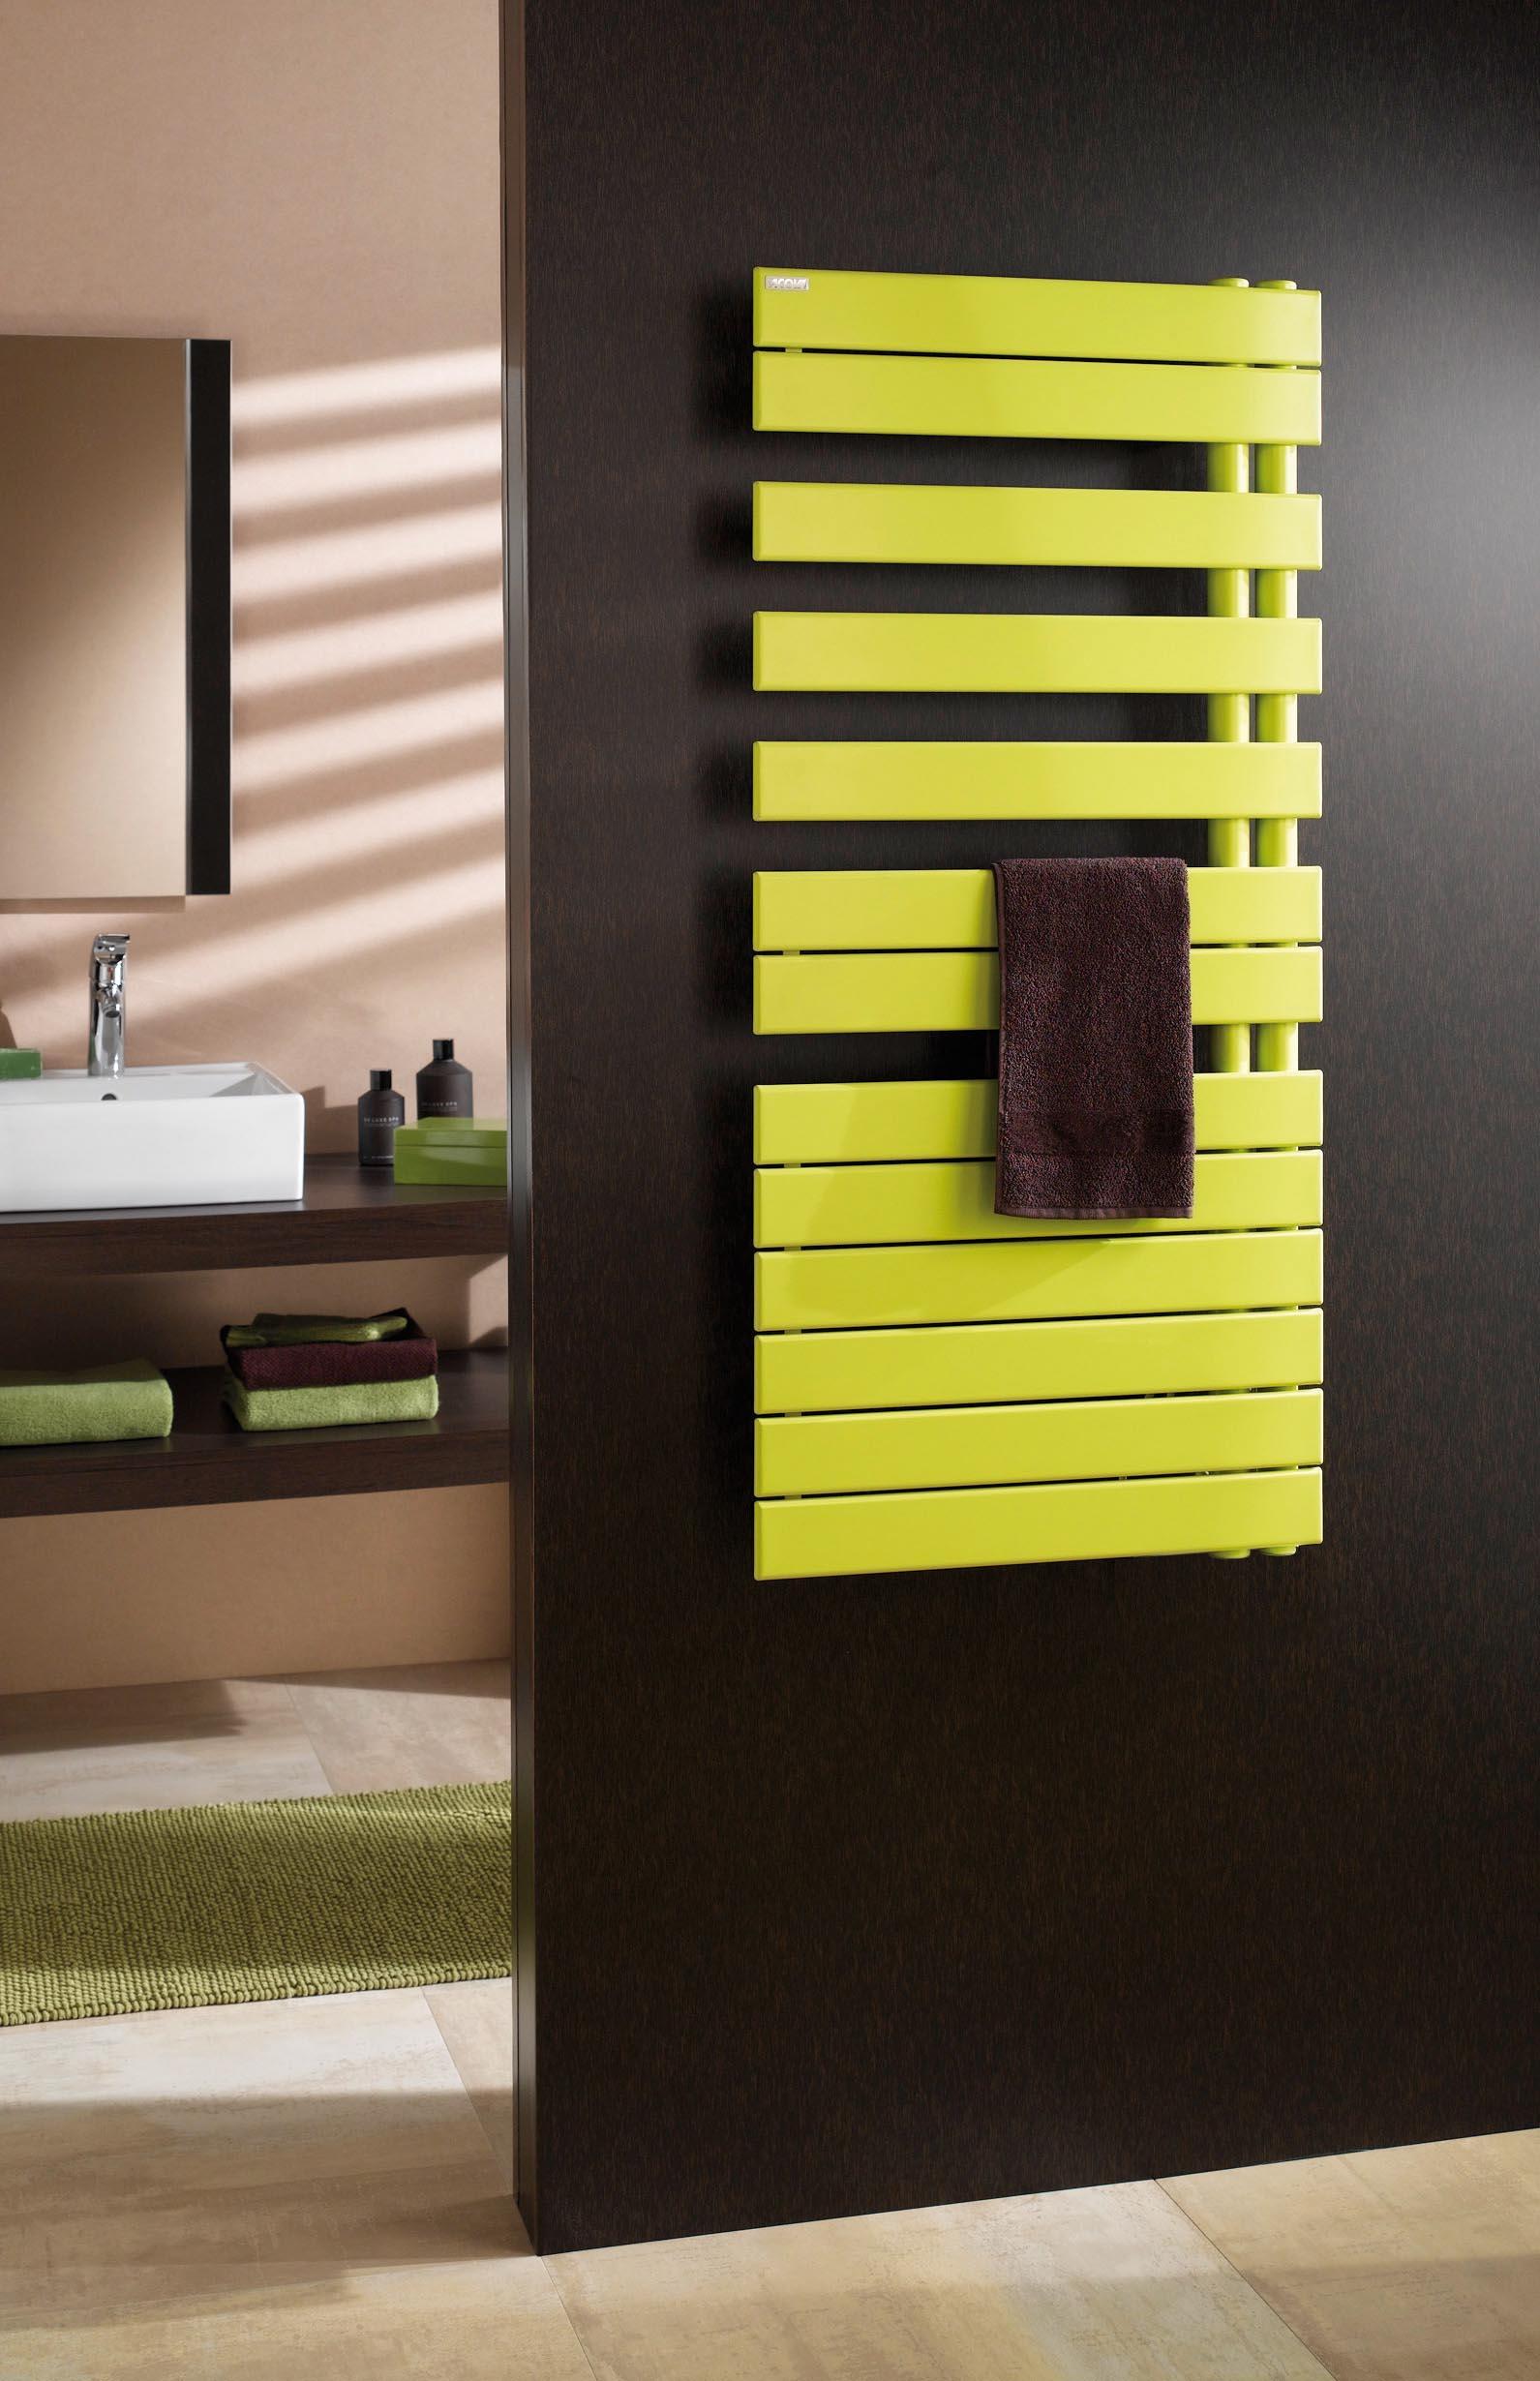 S che serviettes fassane spa eau chaude acova vernon 27200 d stockage h - Seche serviette eau chaude acova ...